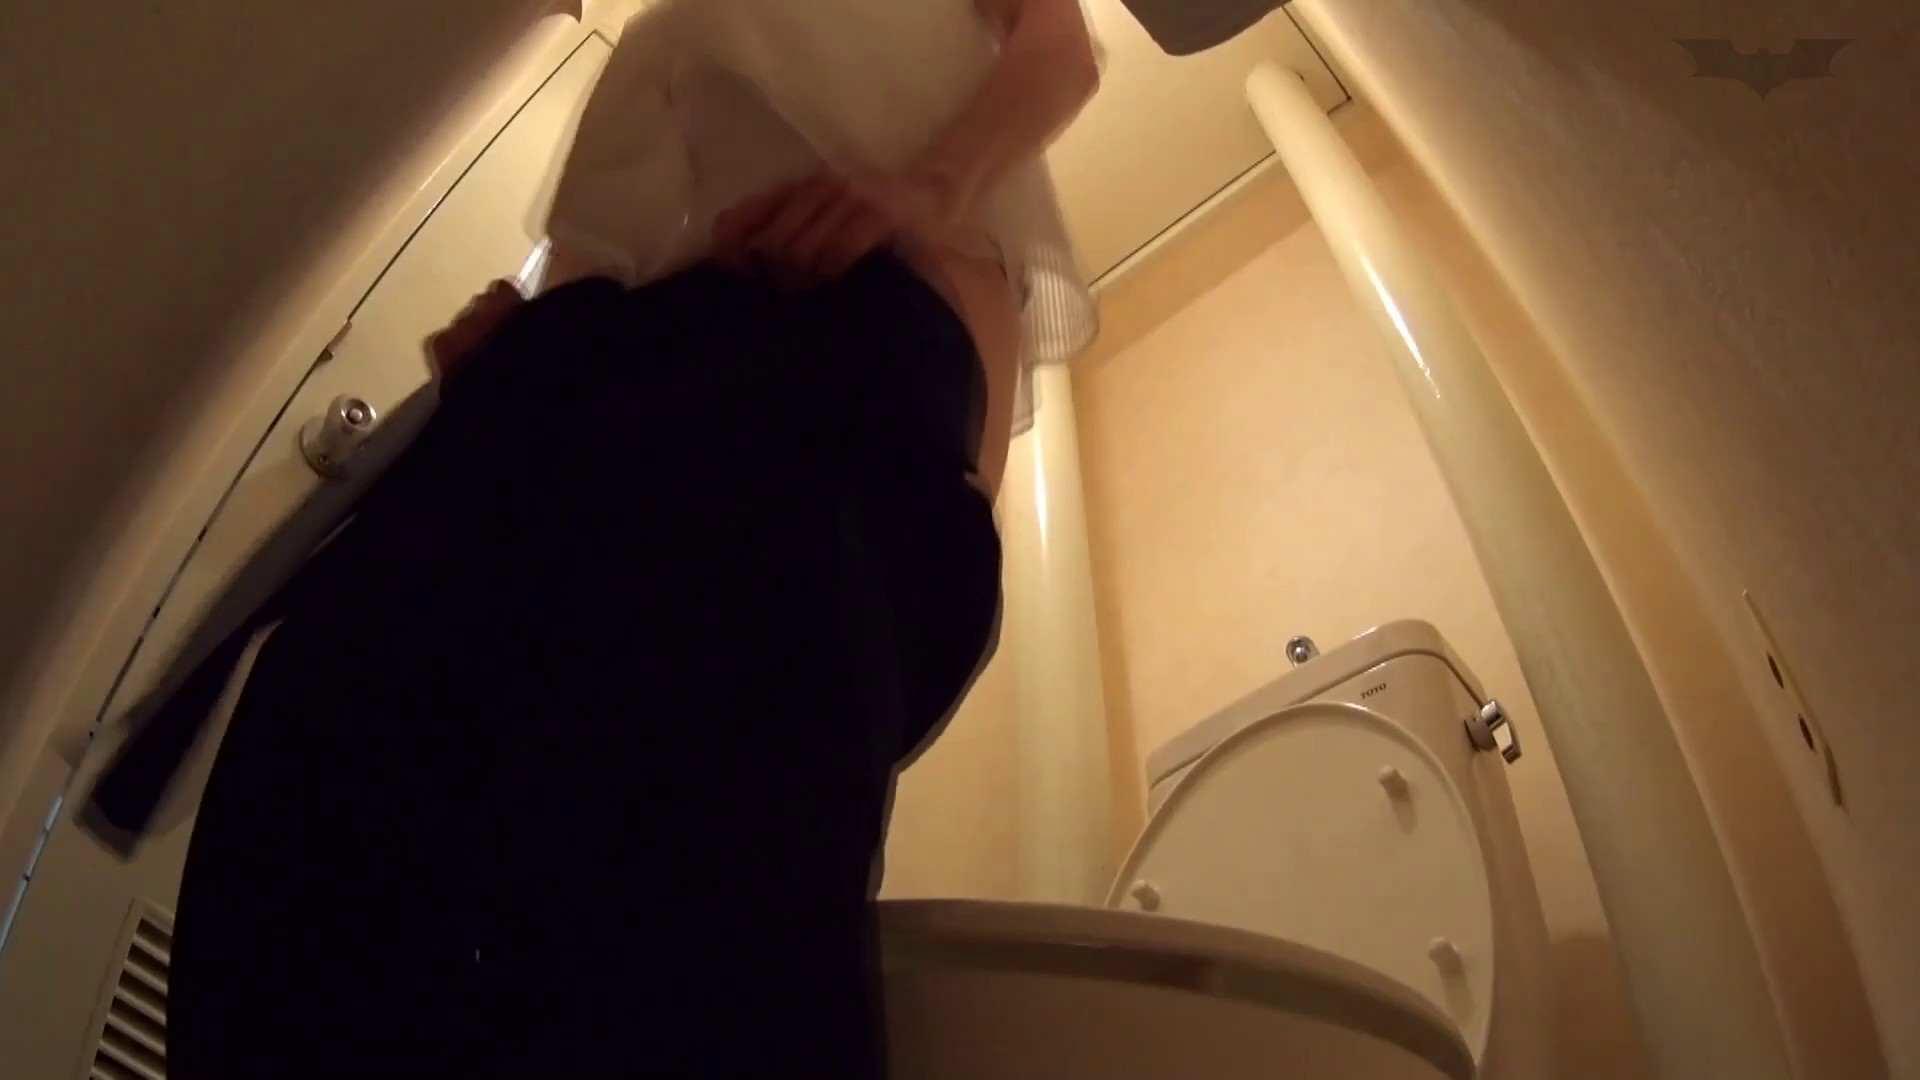 vol.04[洗面所]実はコレが目的でした。-脱糞美人お女市さまと巨乳大学生- 巨乳 濡れ場動画紹介 39連発 33